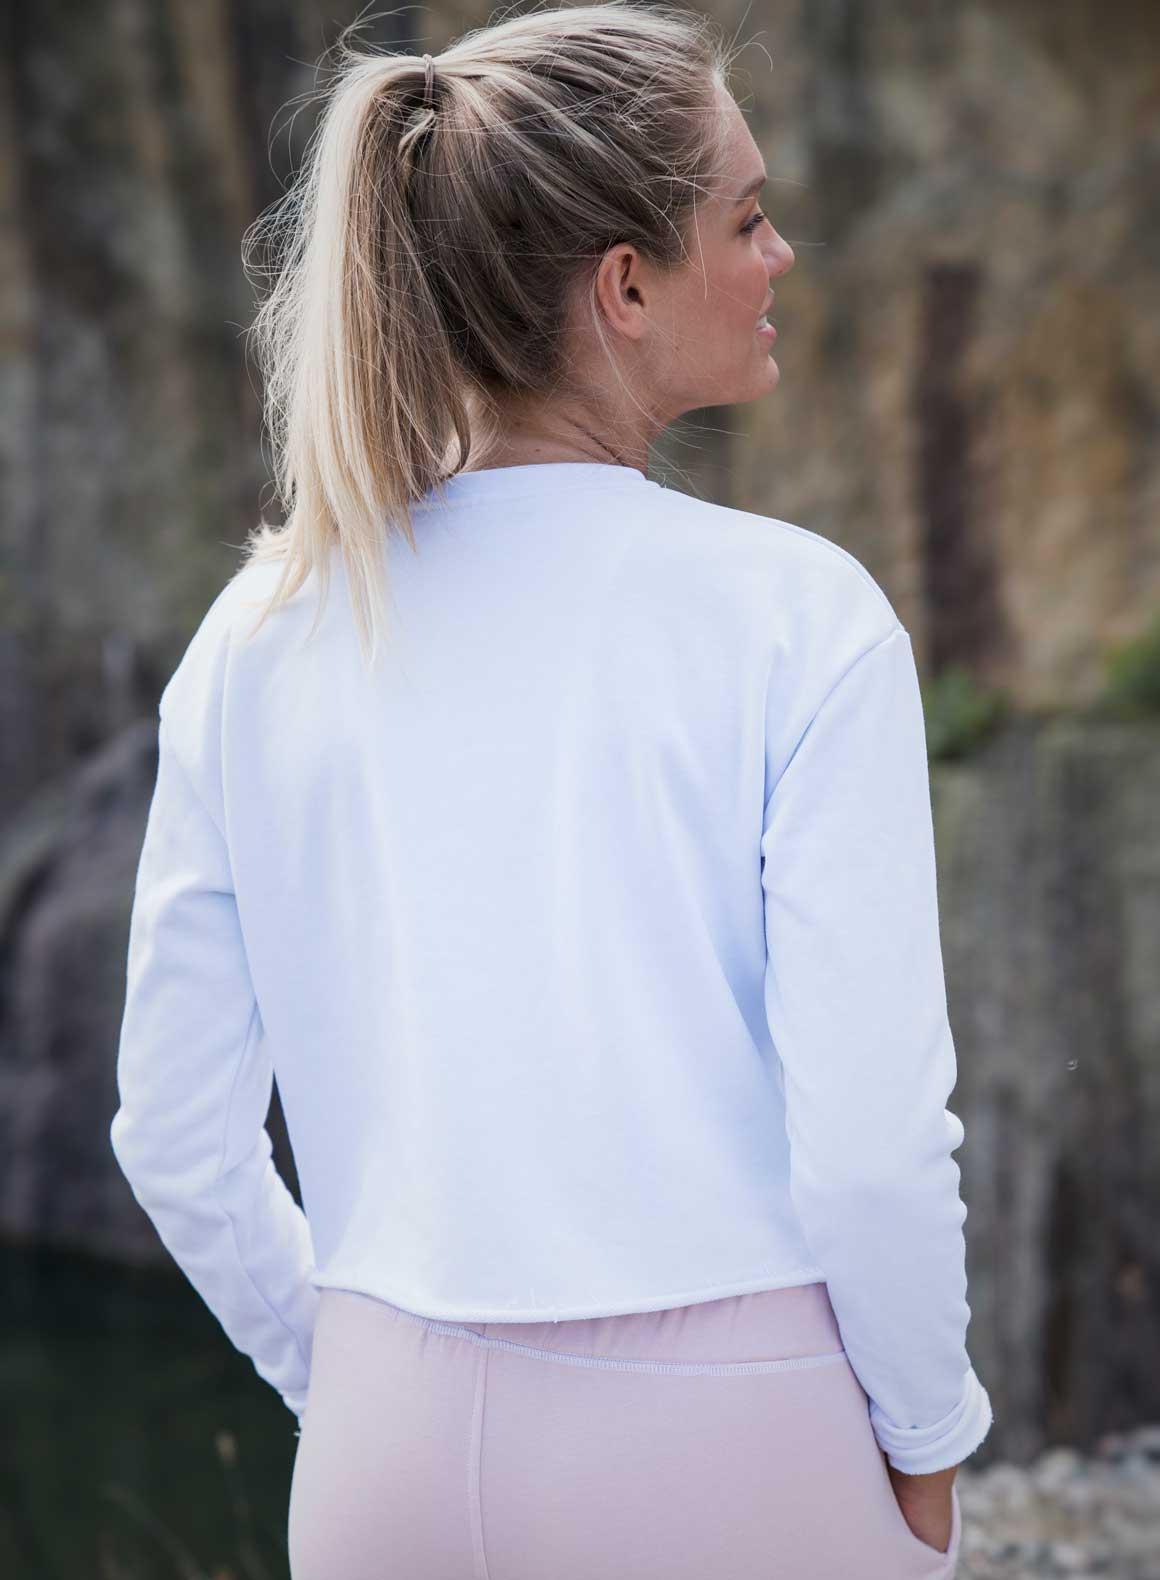 Aim'n White Crop Sweatshirt 17050009 b